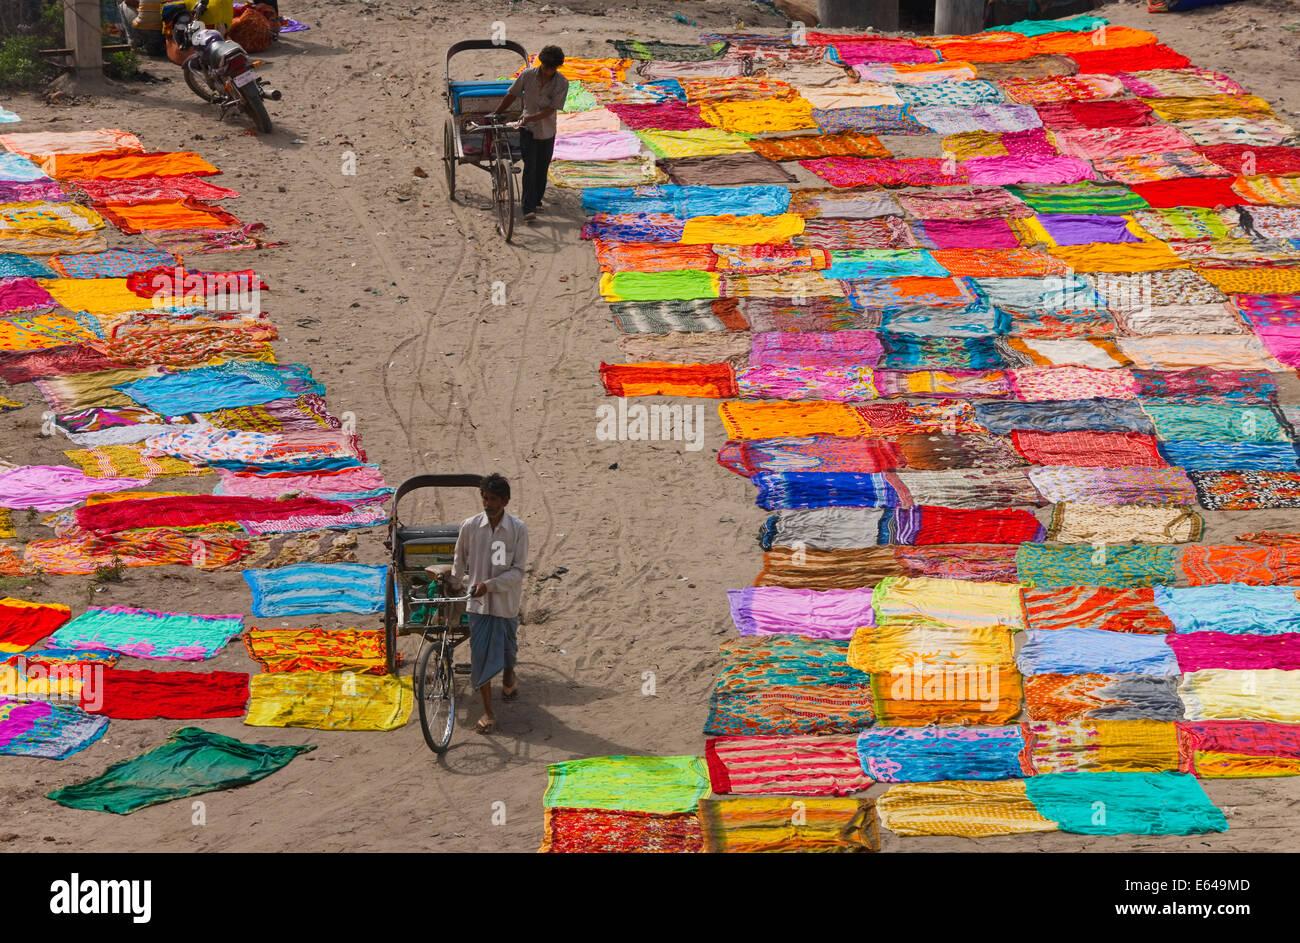 Drying sari's after washing on banks of River Yamuna, Agra, India - Stock Image